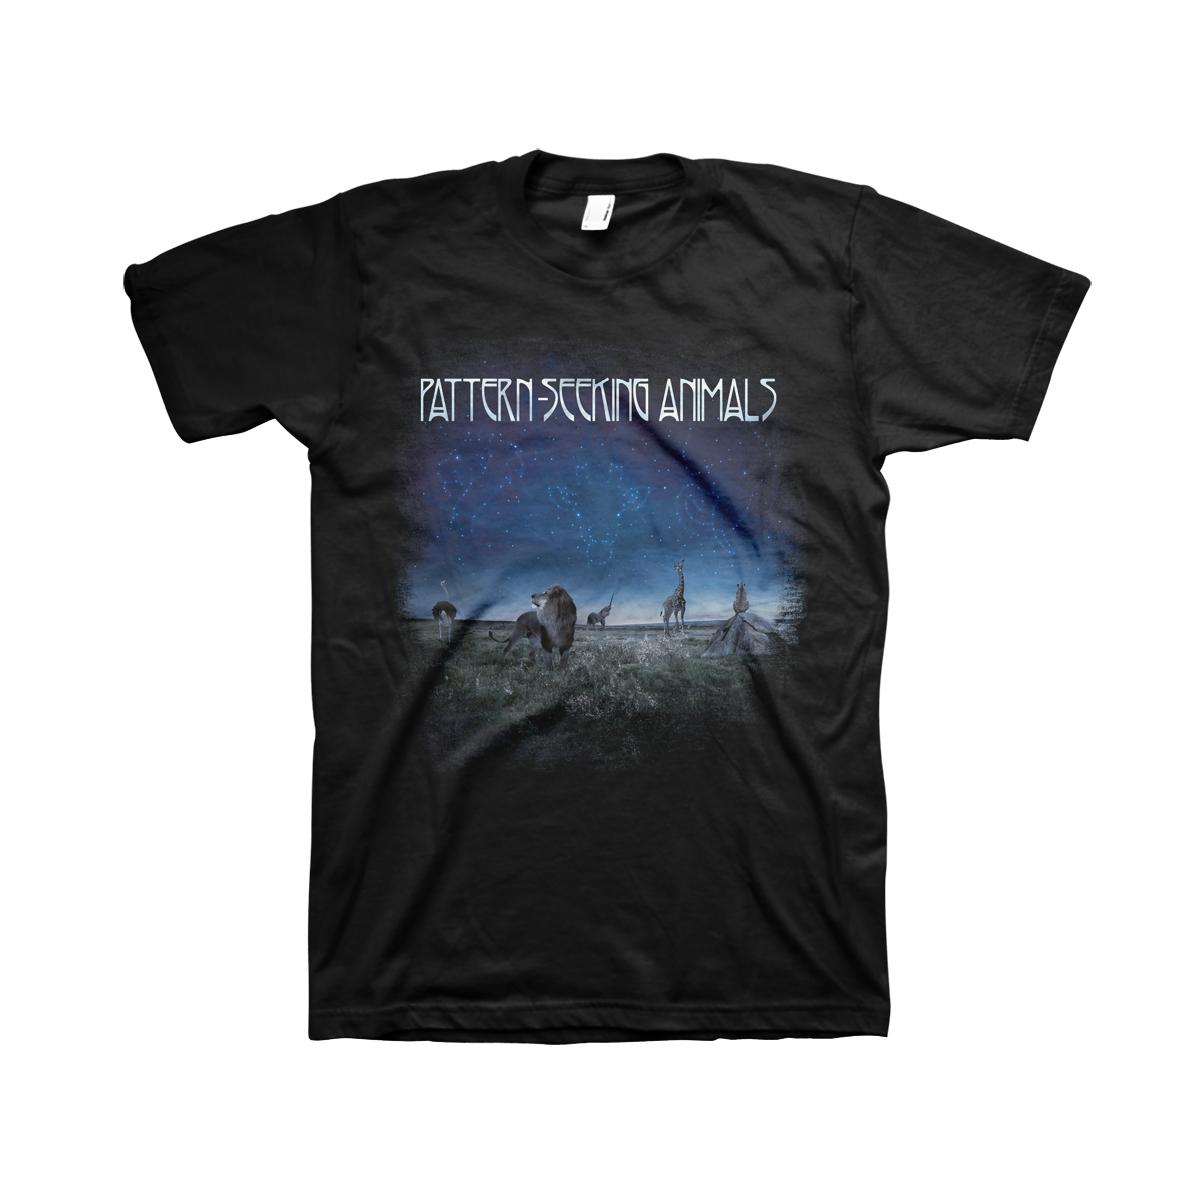 Pattern-Seeking Animals - Album Cover T-shirt